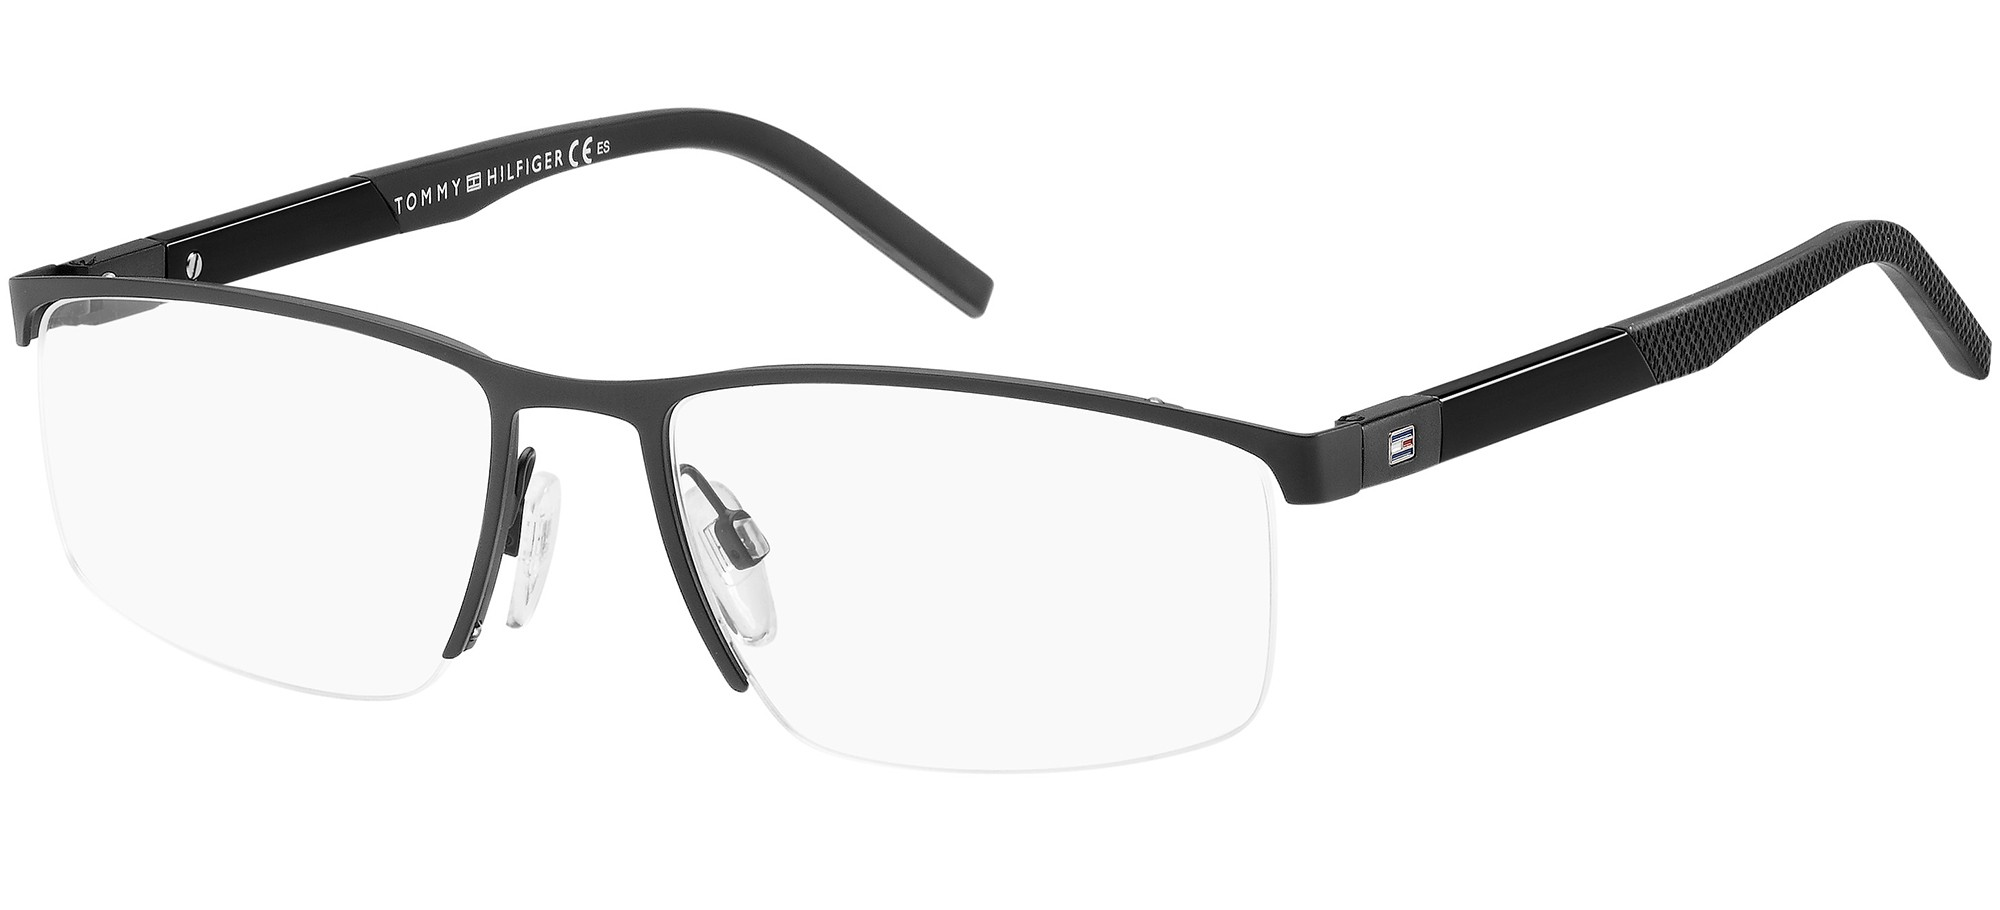 Tommy Hilfiger briller TH 1640